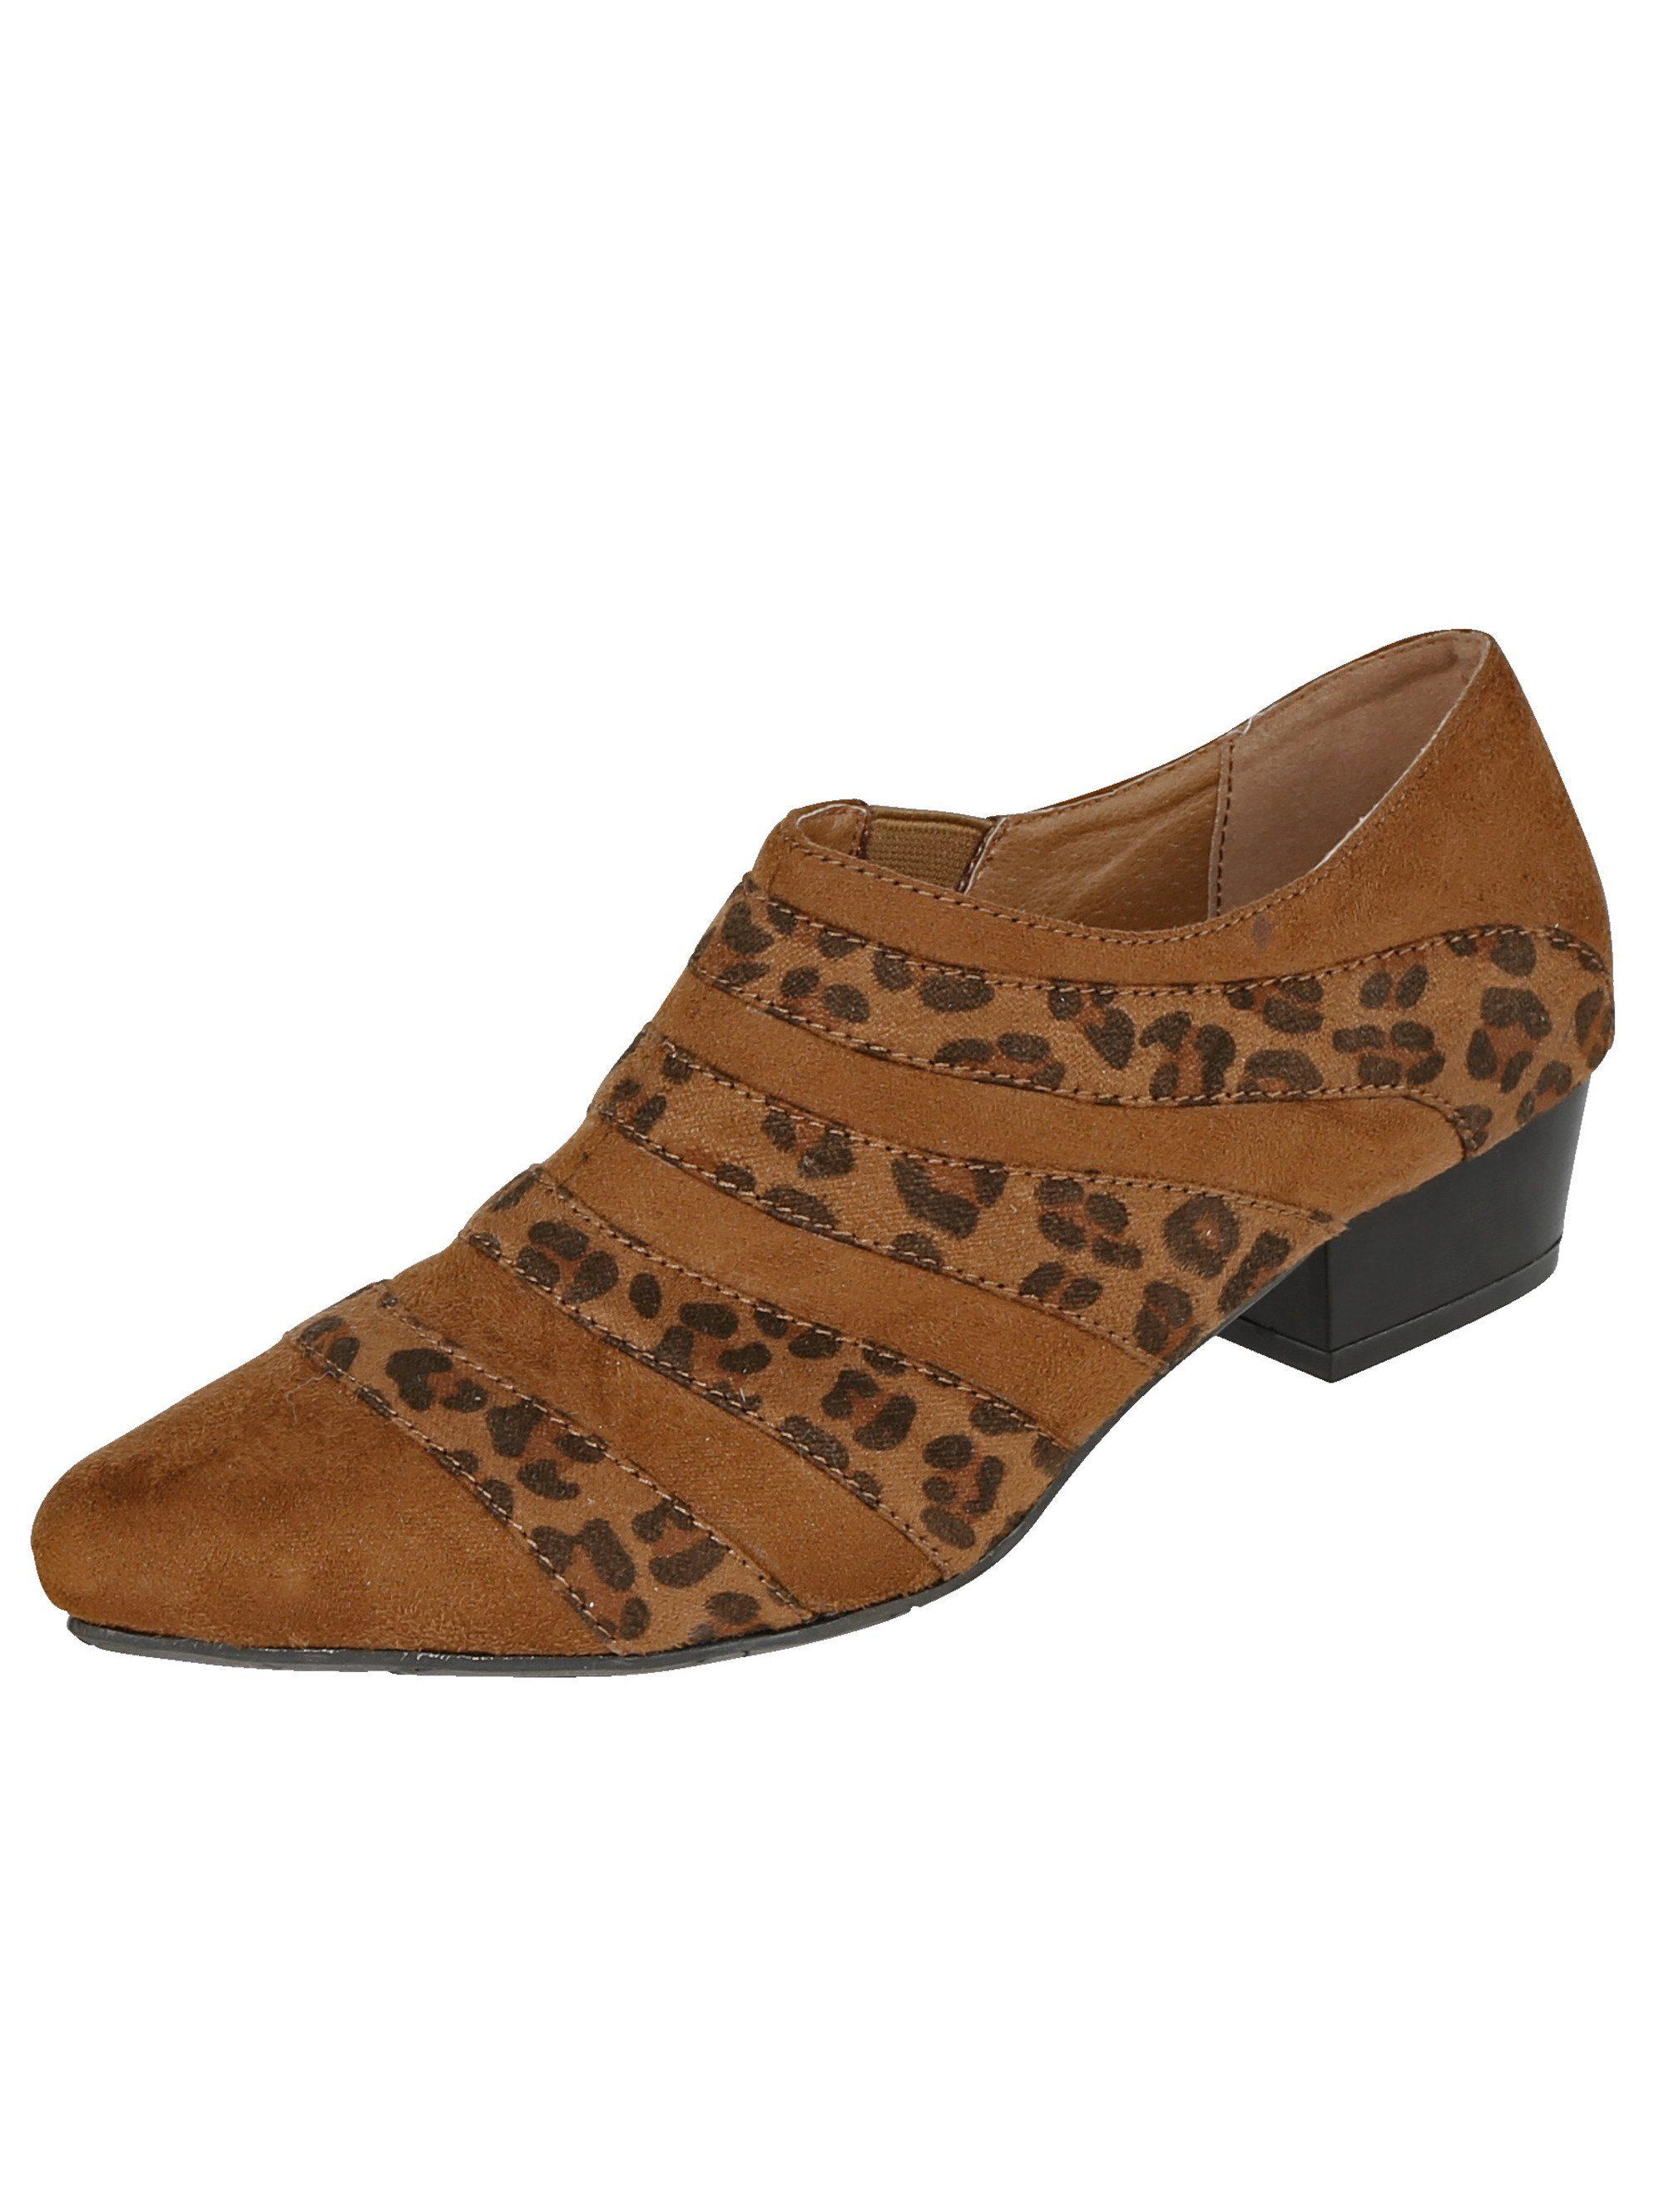 Liva Loop Ankle Boot in spitzer Silhouette kaufen  hellbraun#ft5_slash#leo